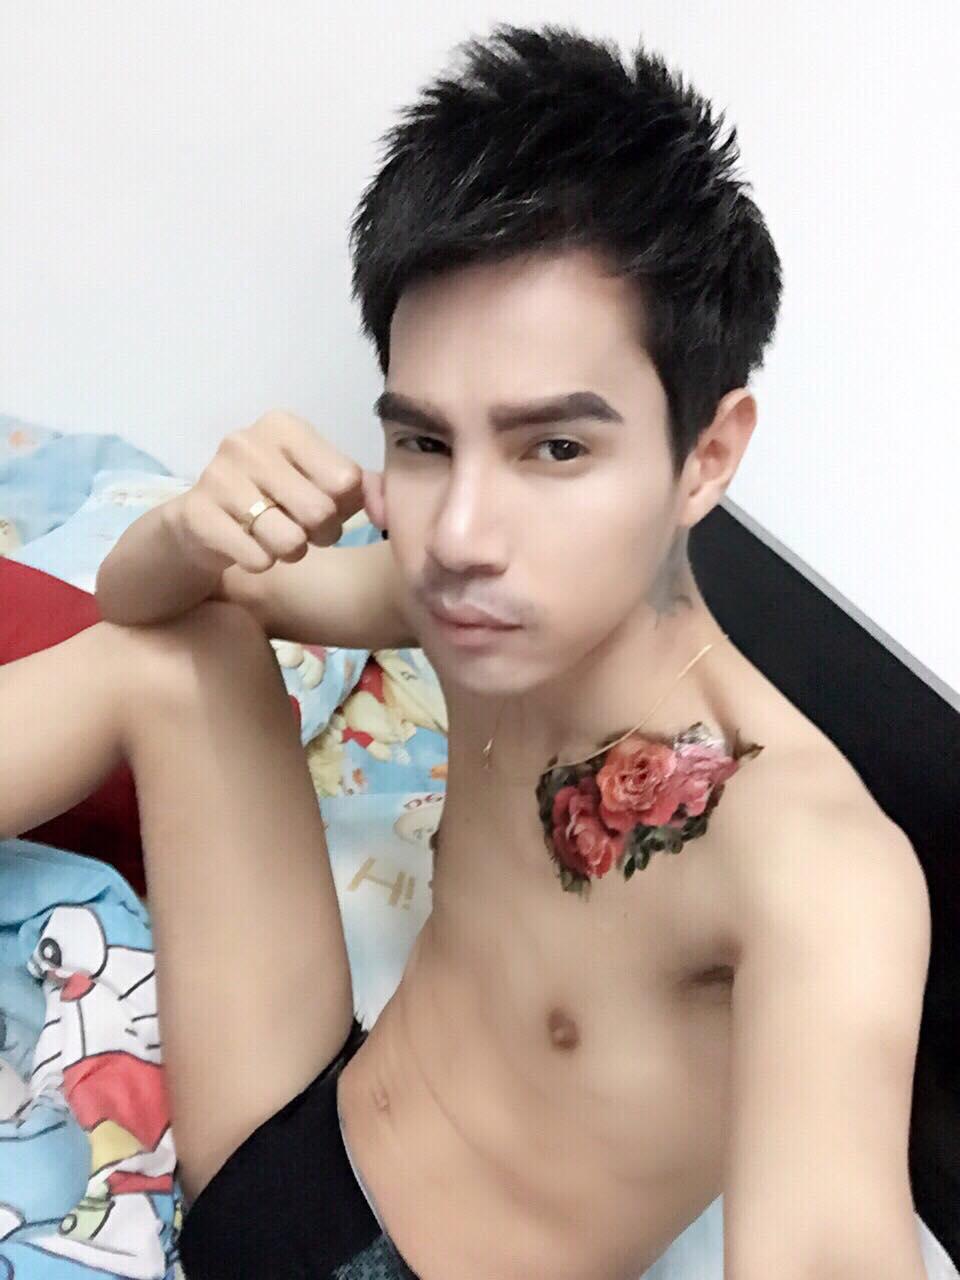 Gay Massage Boy Gallery - Common Massage biys from Chiang Mai